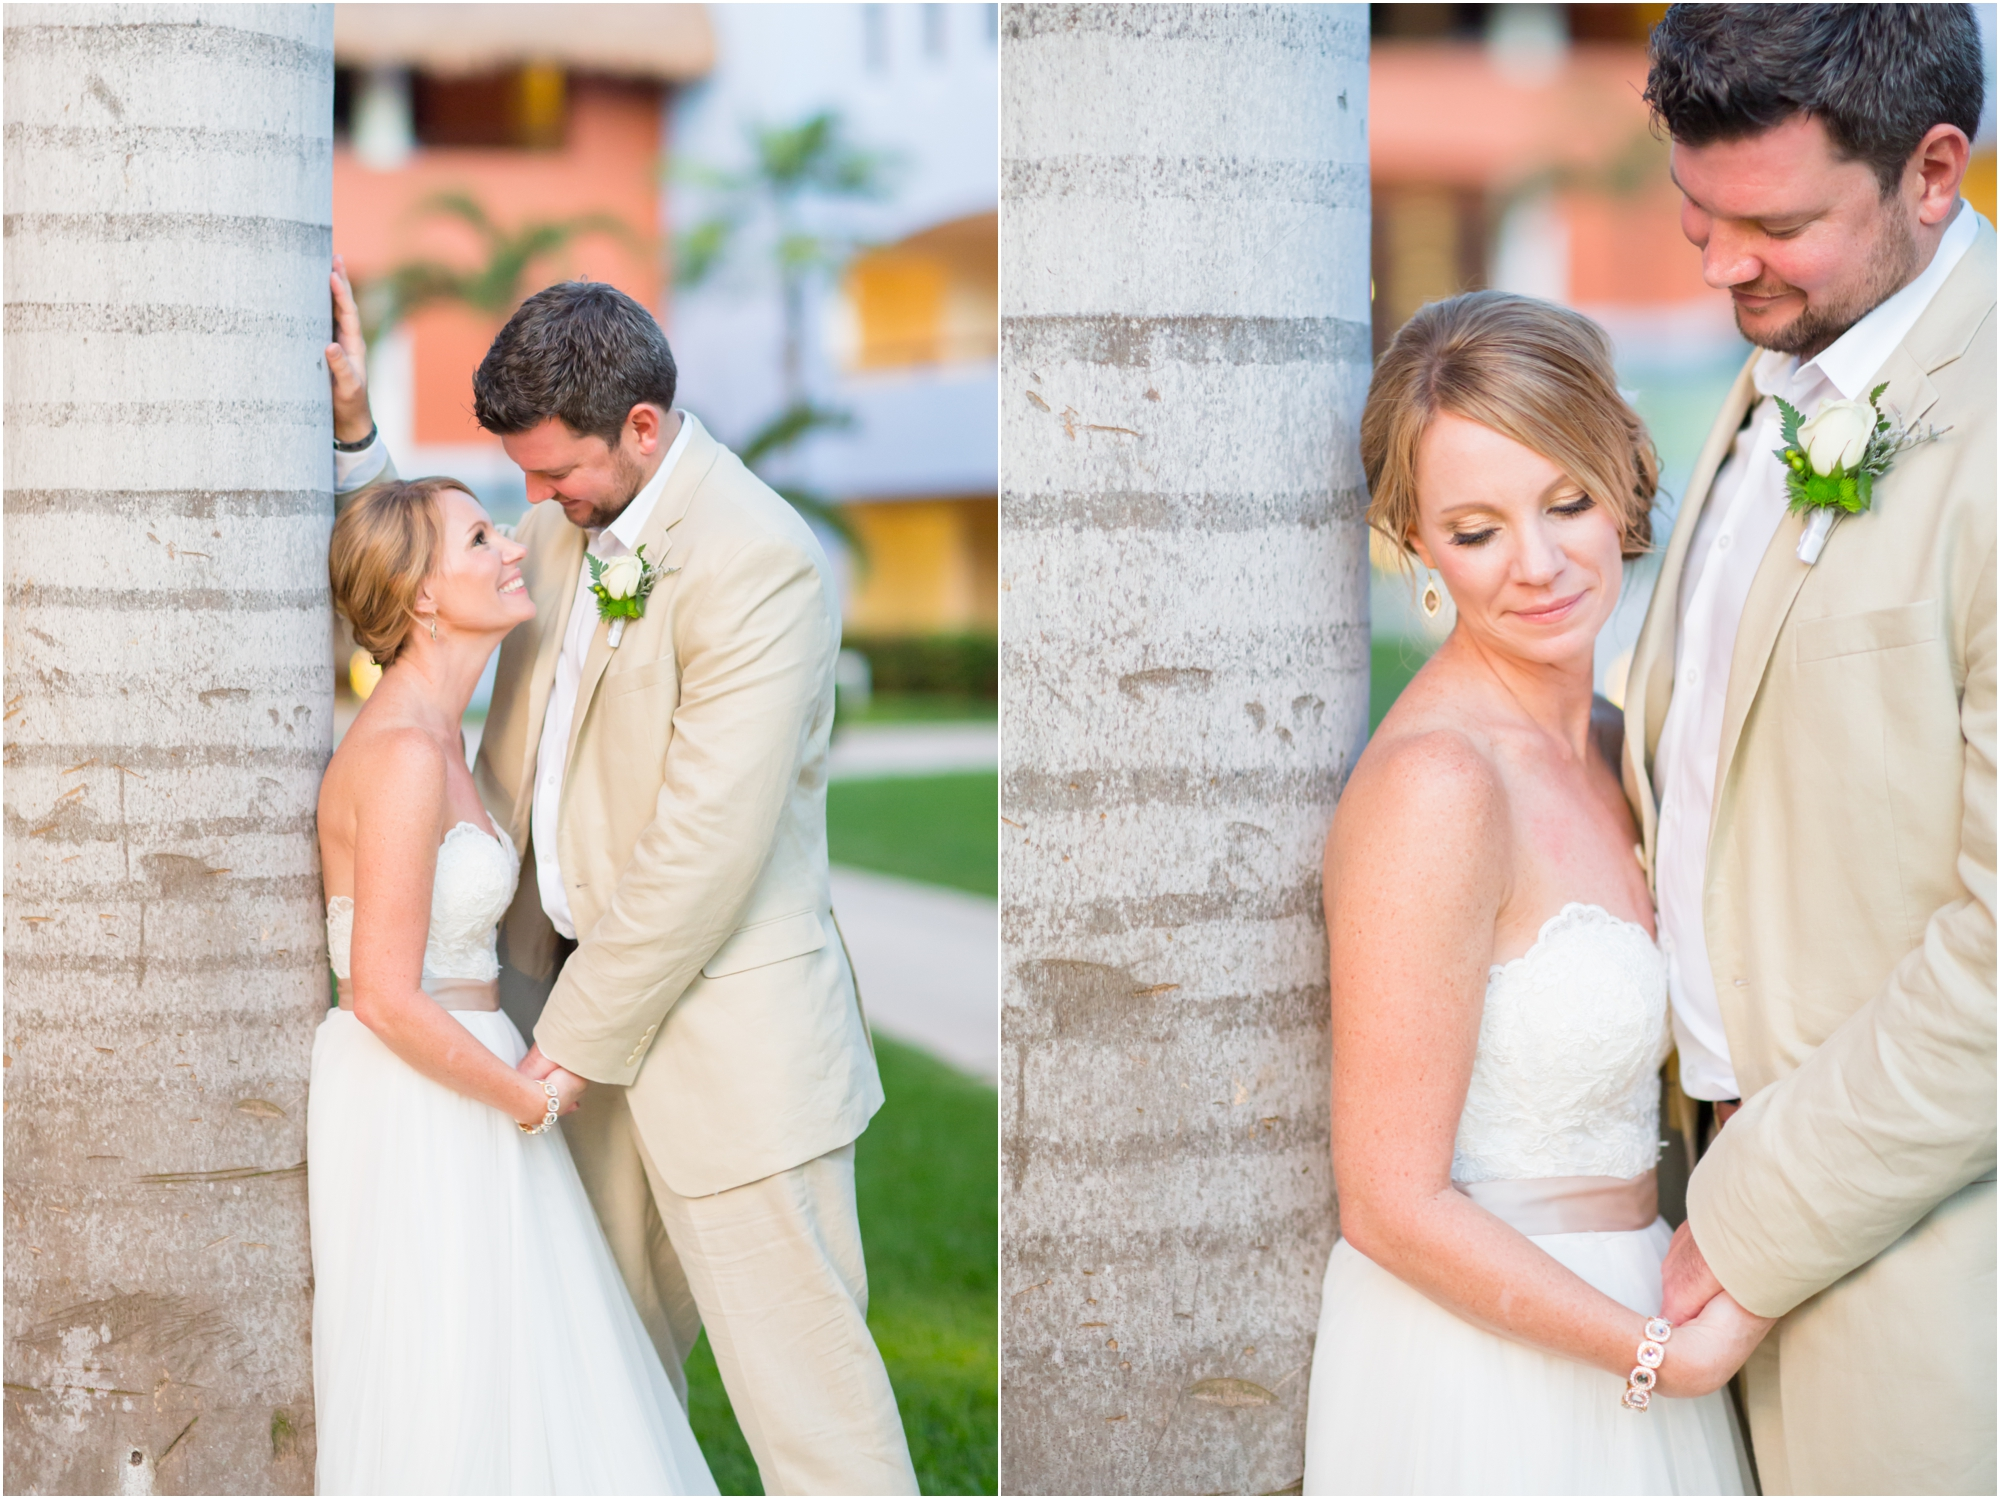 Morosoff Wedding 4-Bride & Groom Portraits-573_anna grace photography destination wedding photographer playa del carmen mexico photo.jpg